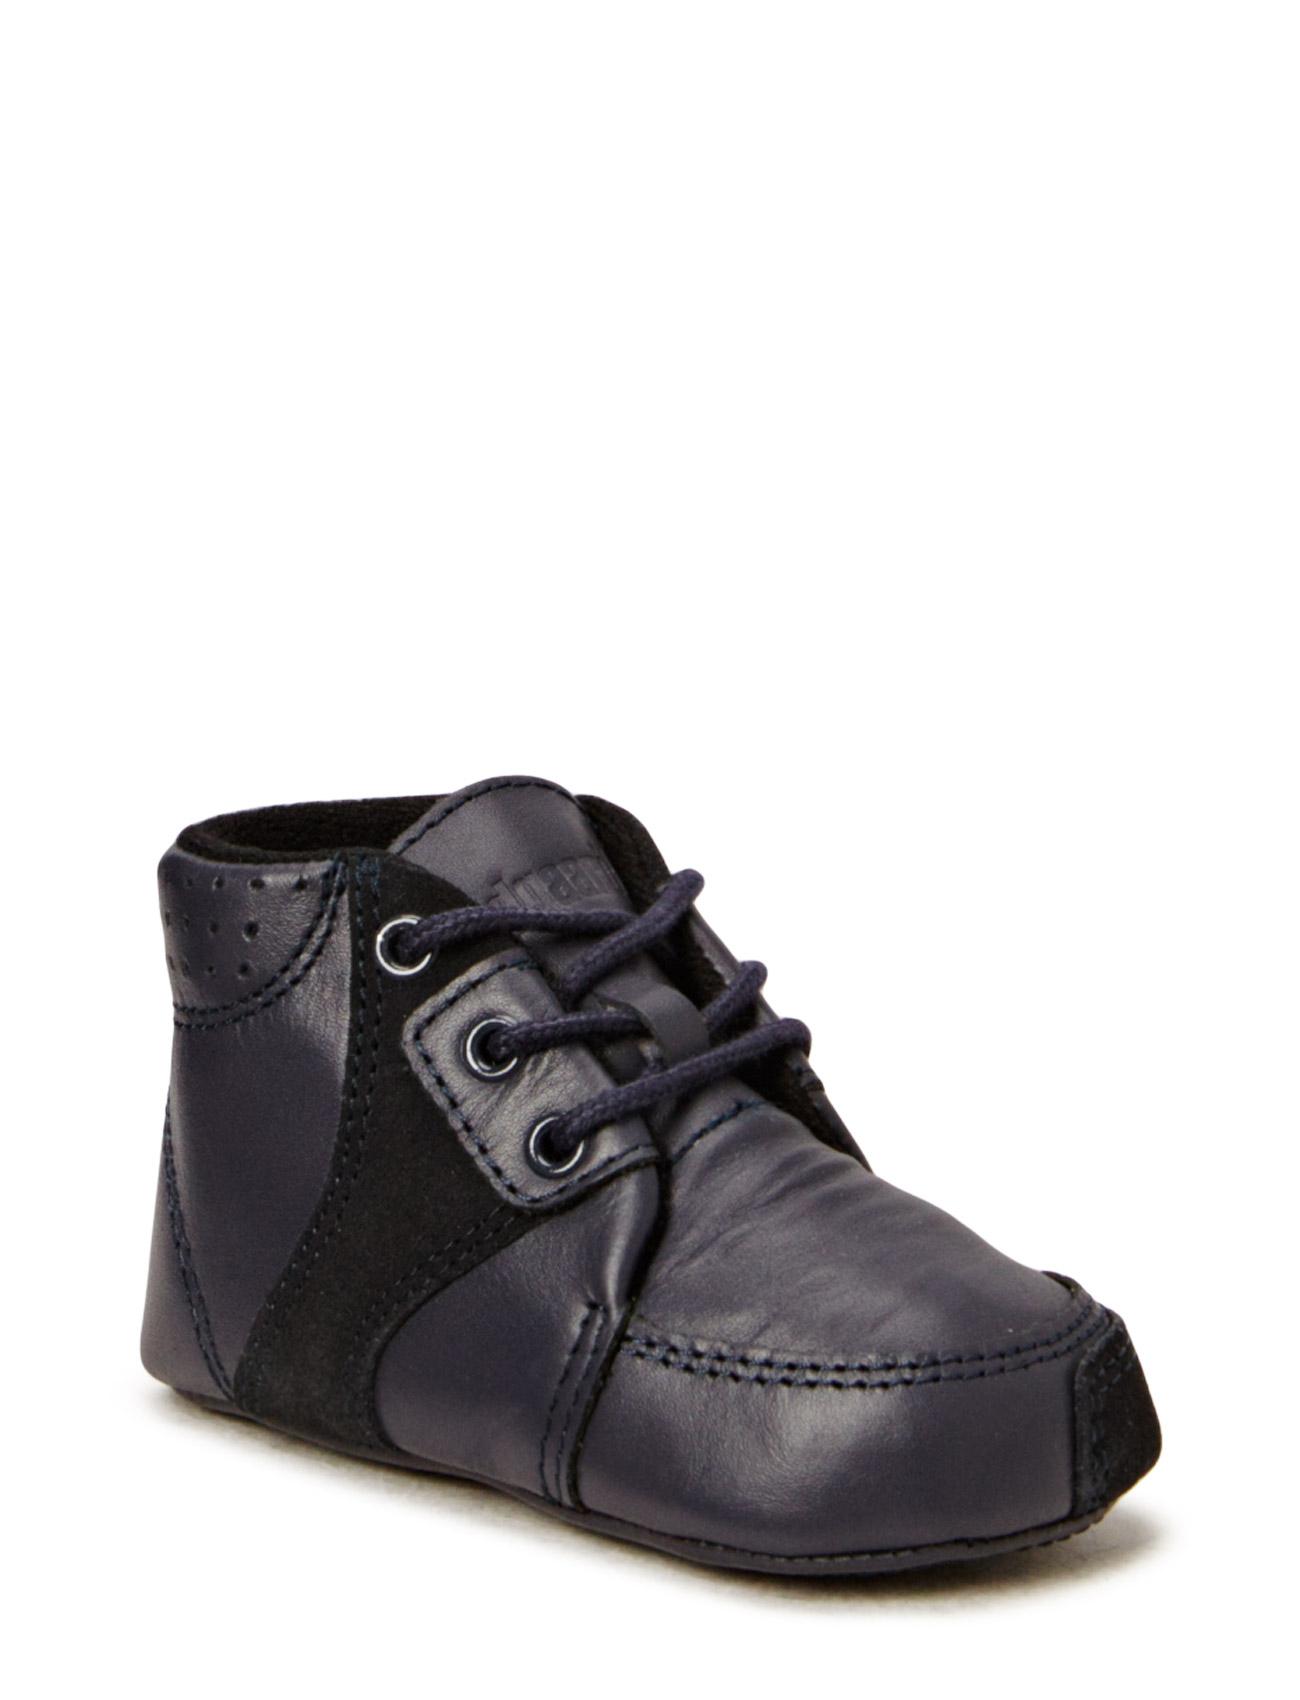 Prewalker Navy W/Lace Bundgaard Sko & Sneakers til Børn i Navy blå